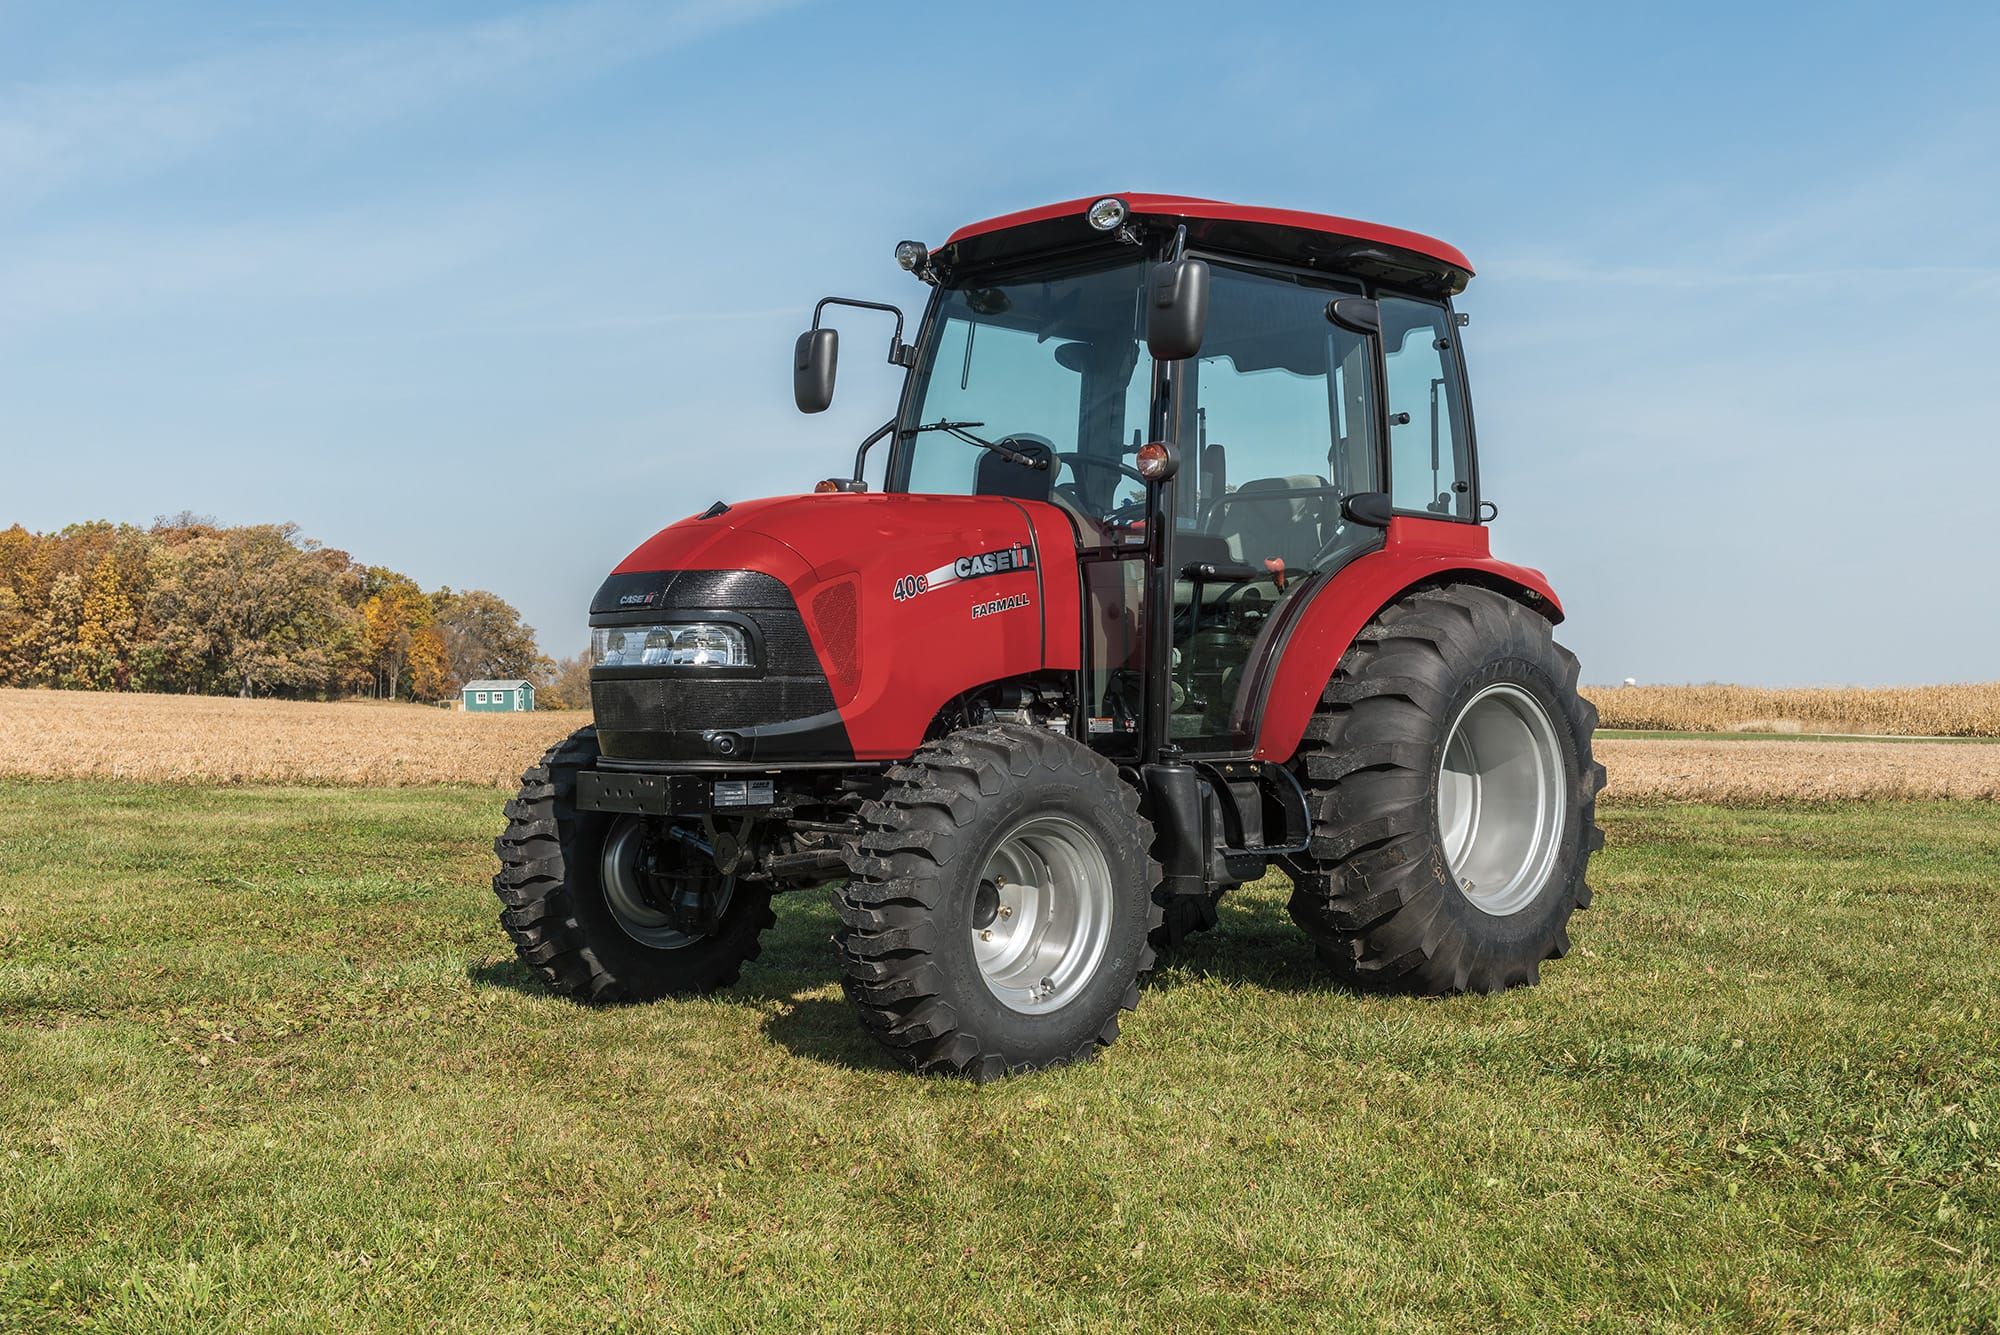 Compact Farmall 40C | Compact Utility Tractors | Case IH